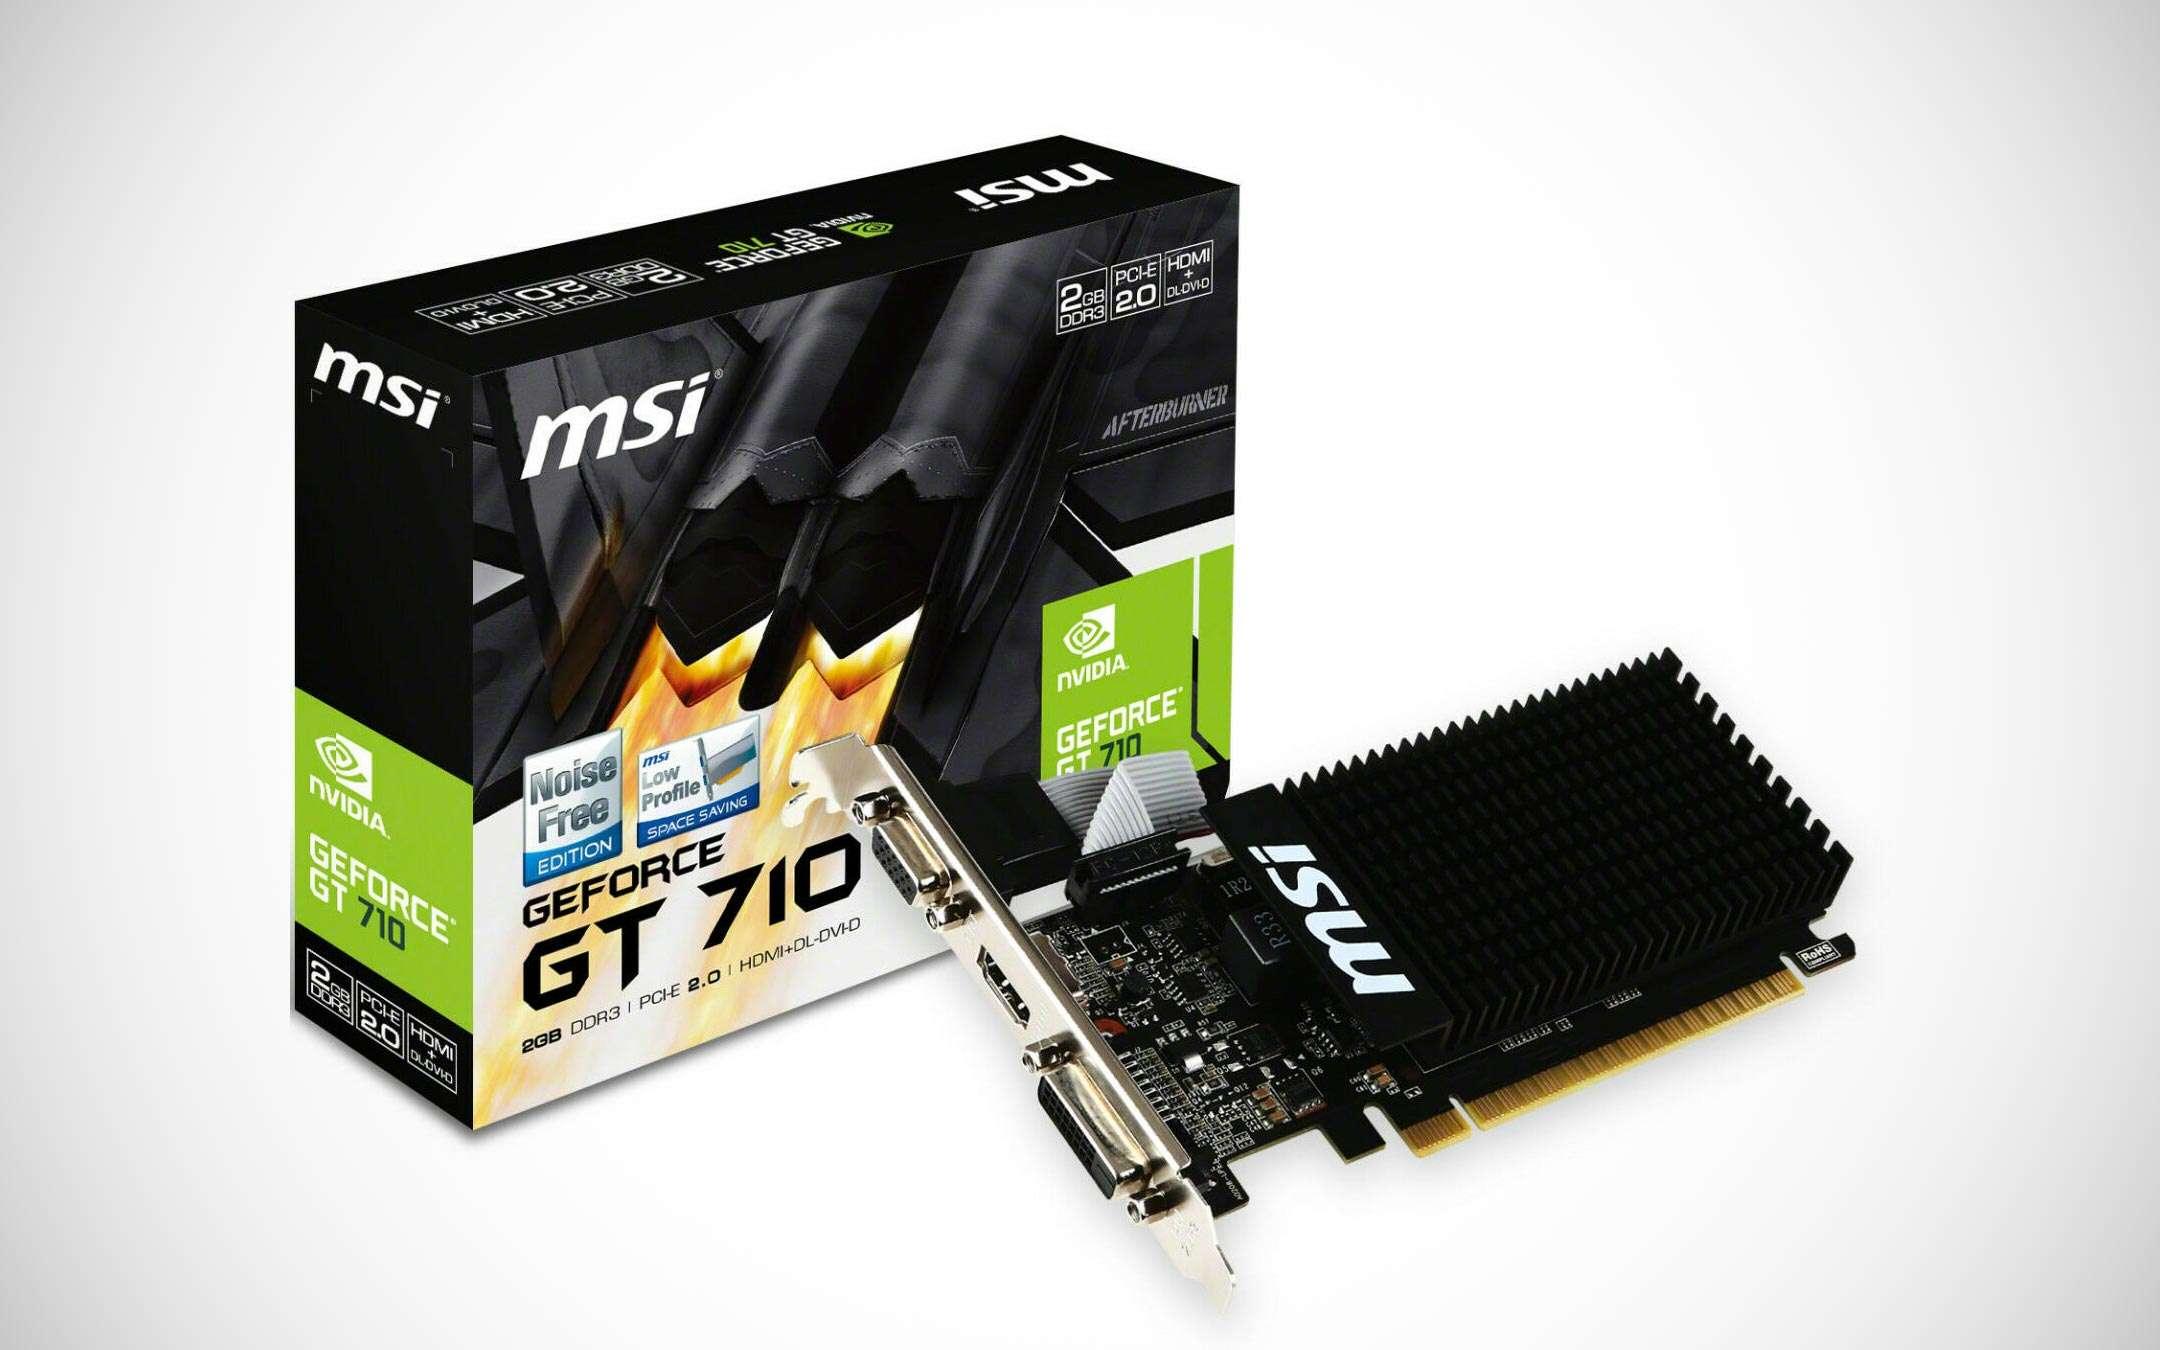 The MSI GeForce GT 710 card on eBay